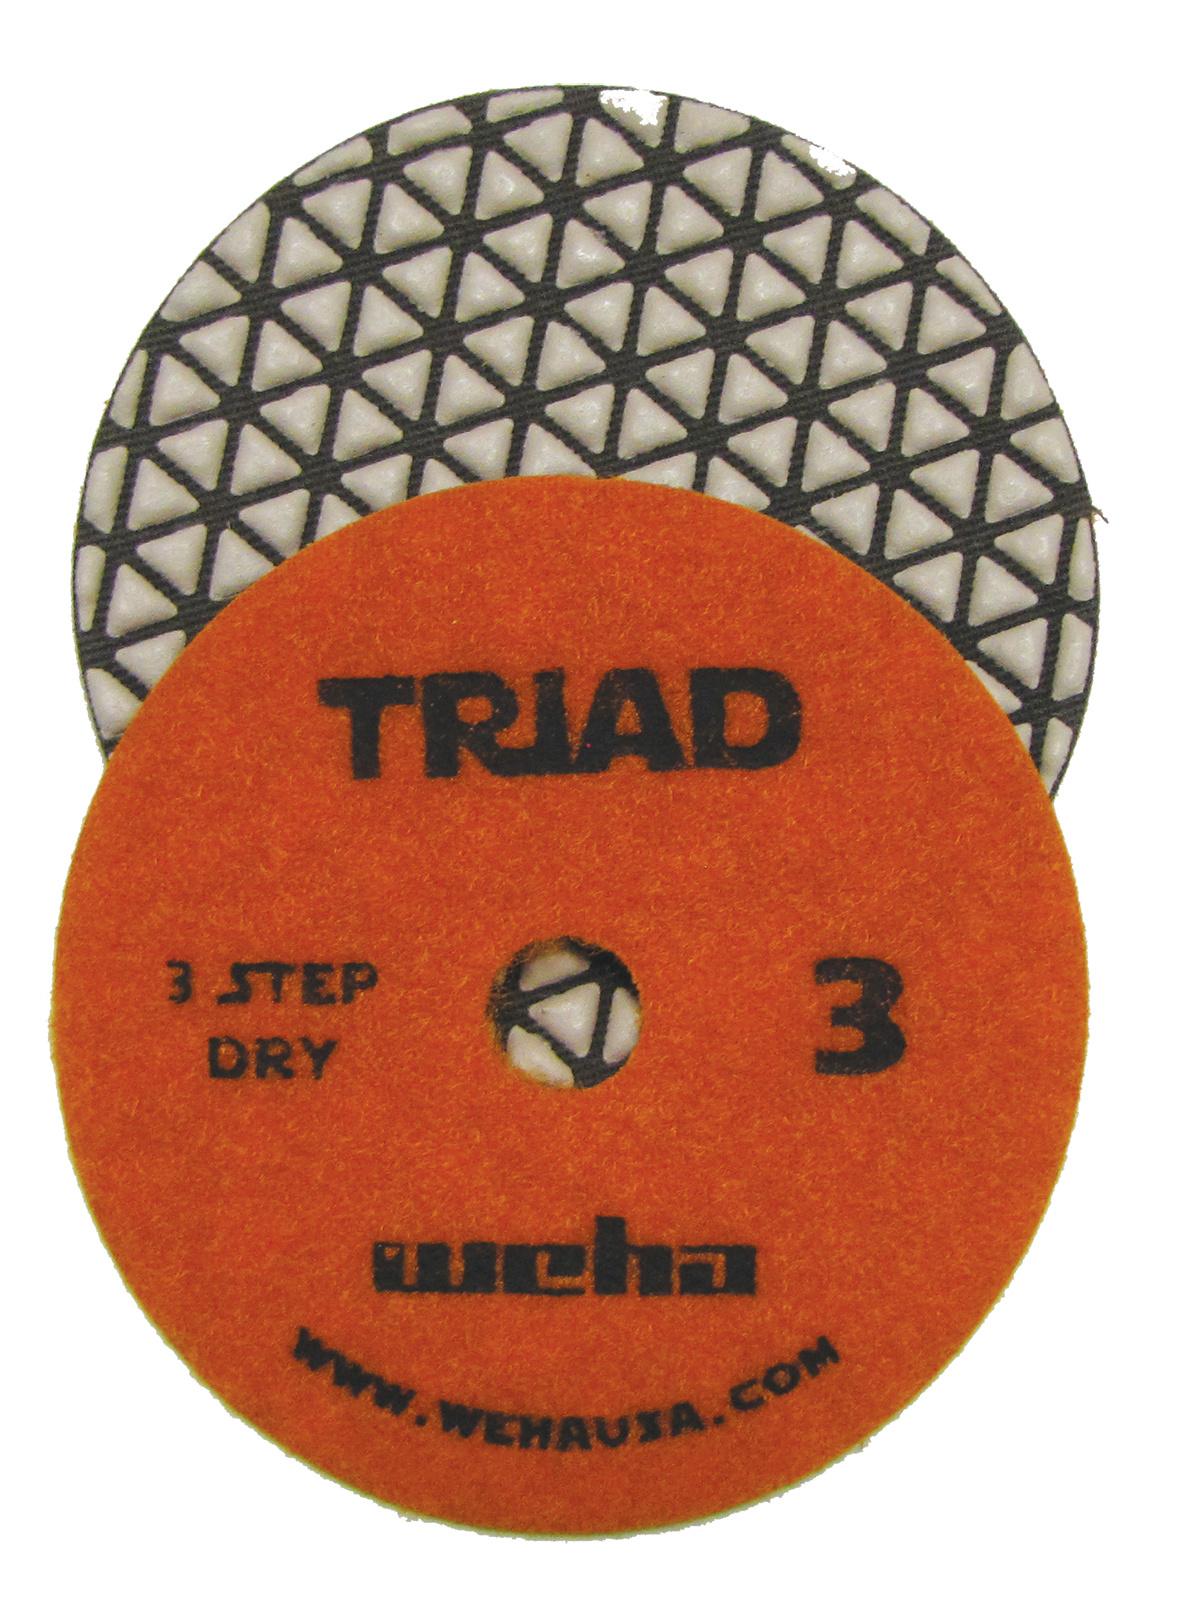 Triad Dry 3 Step Pos 3